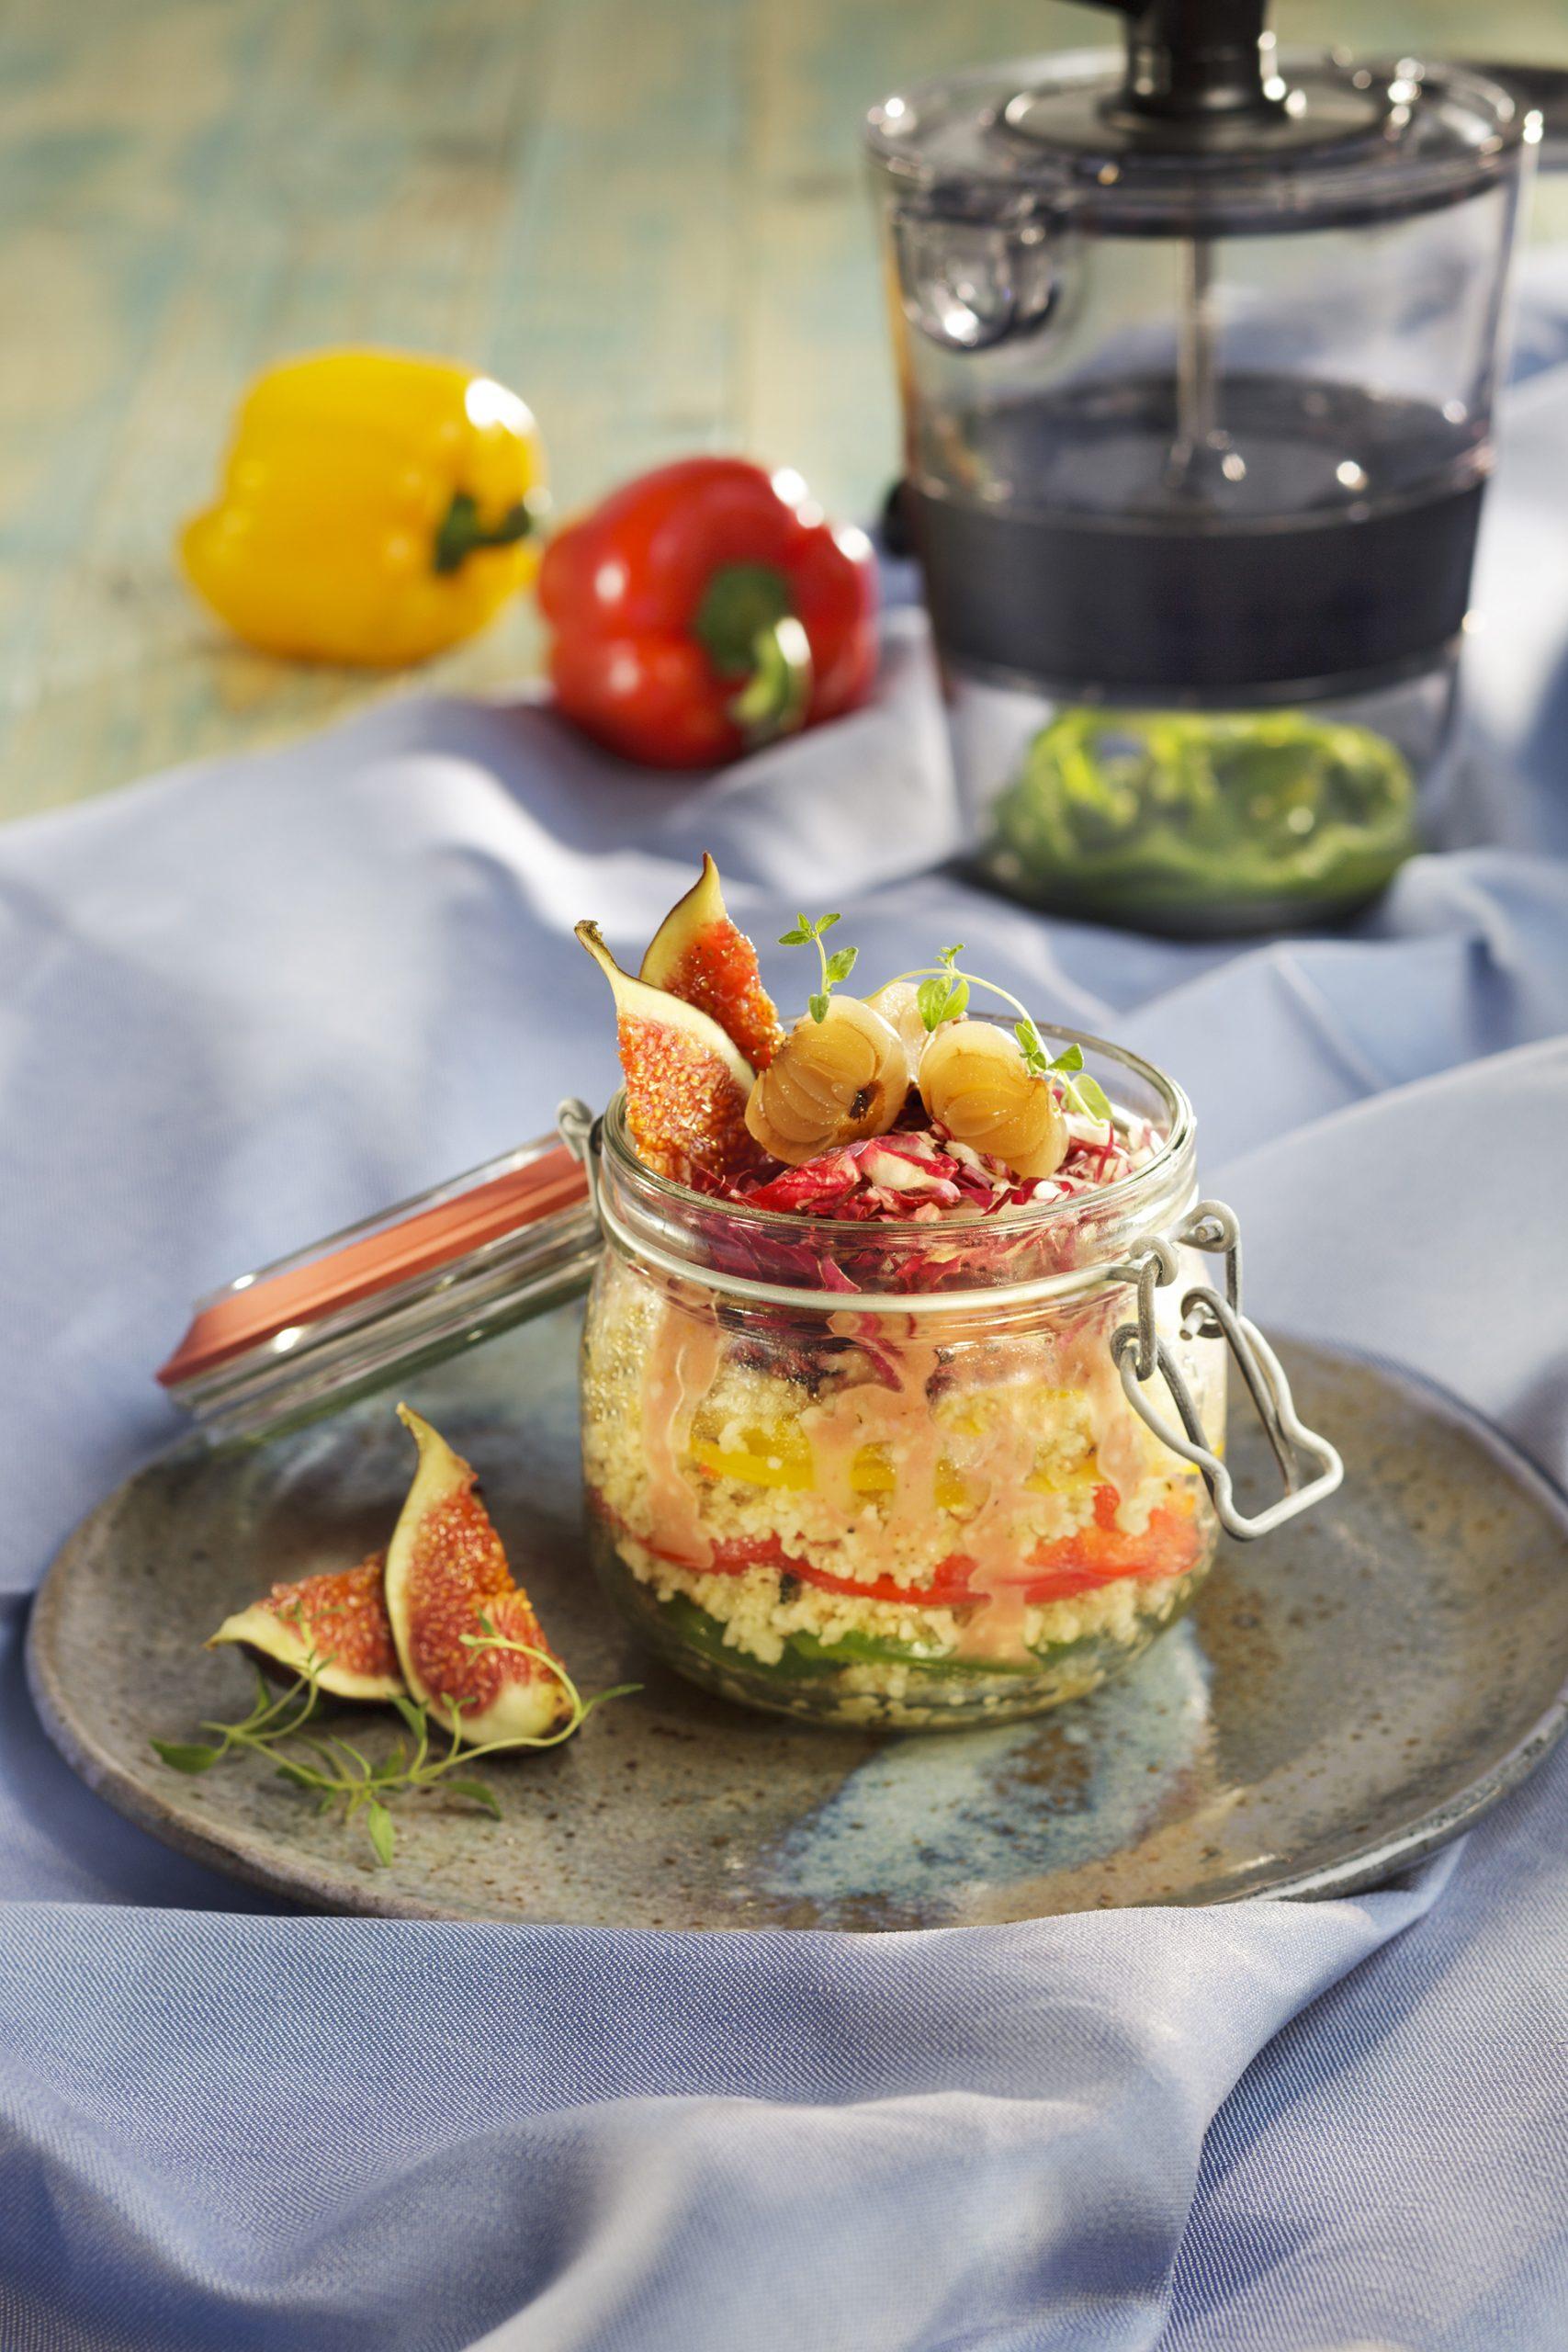 Festlich: Couscous-Paprika-Salat im Glas